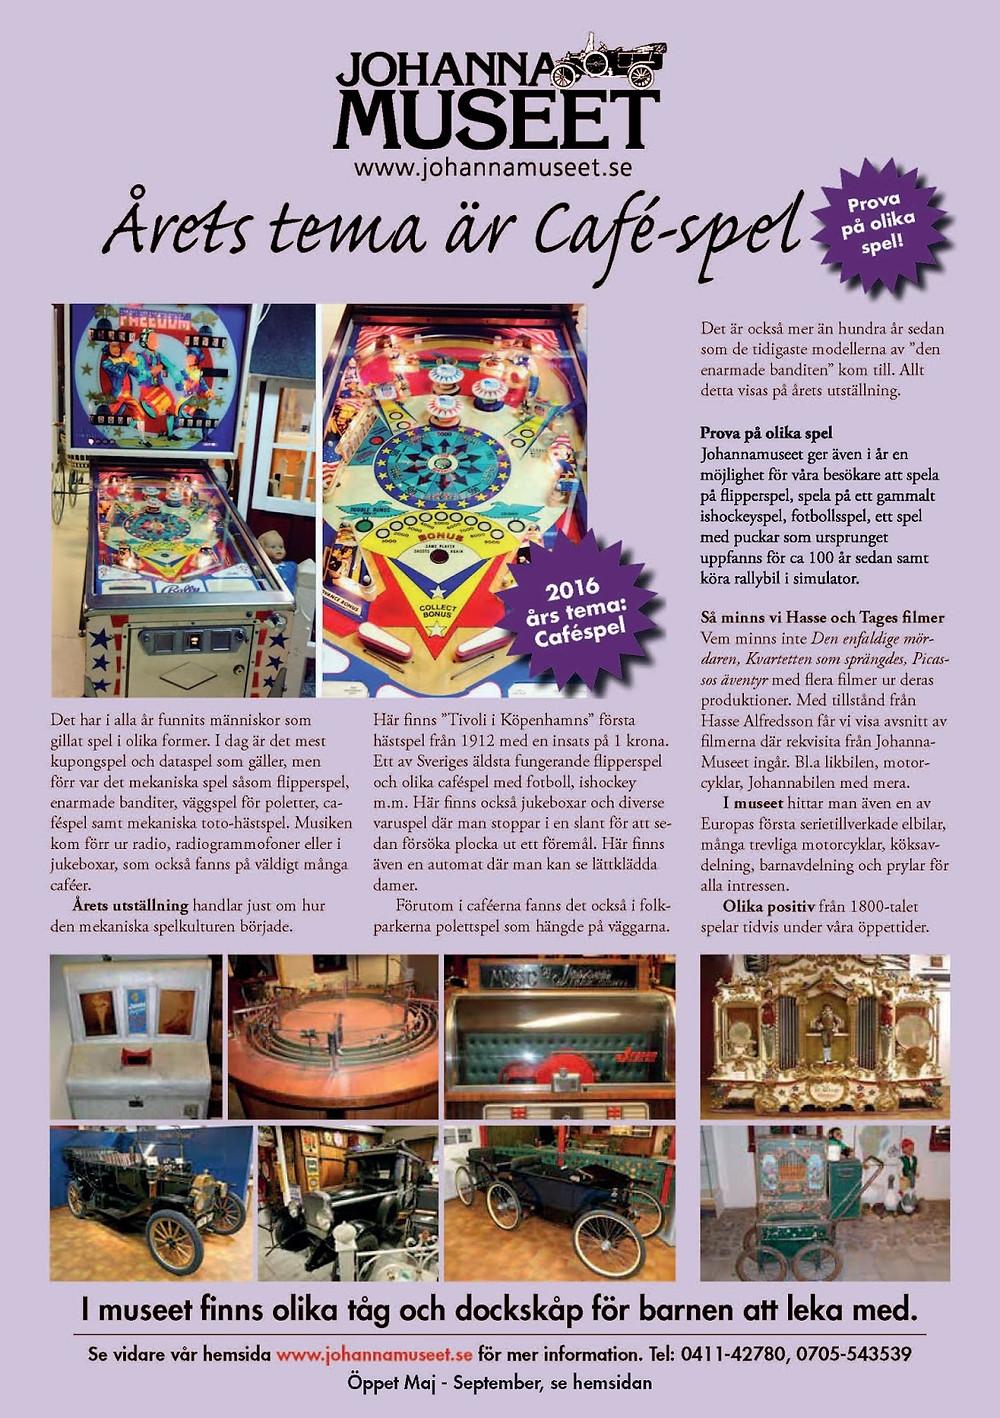 Johanna Museum Exhibit games